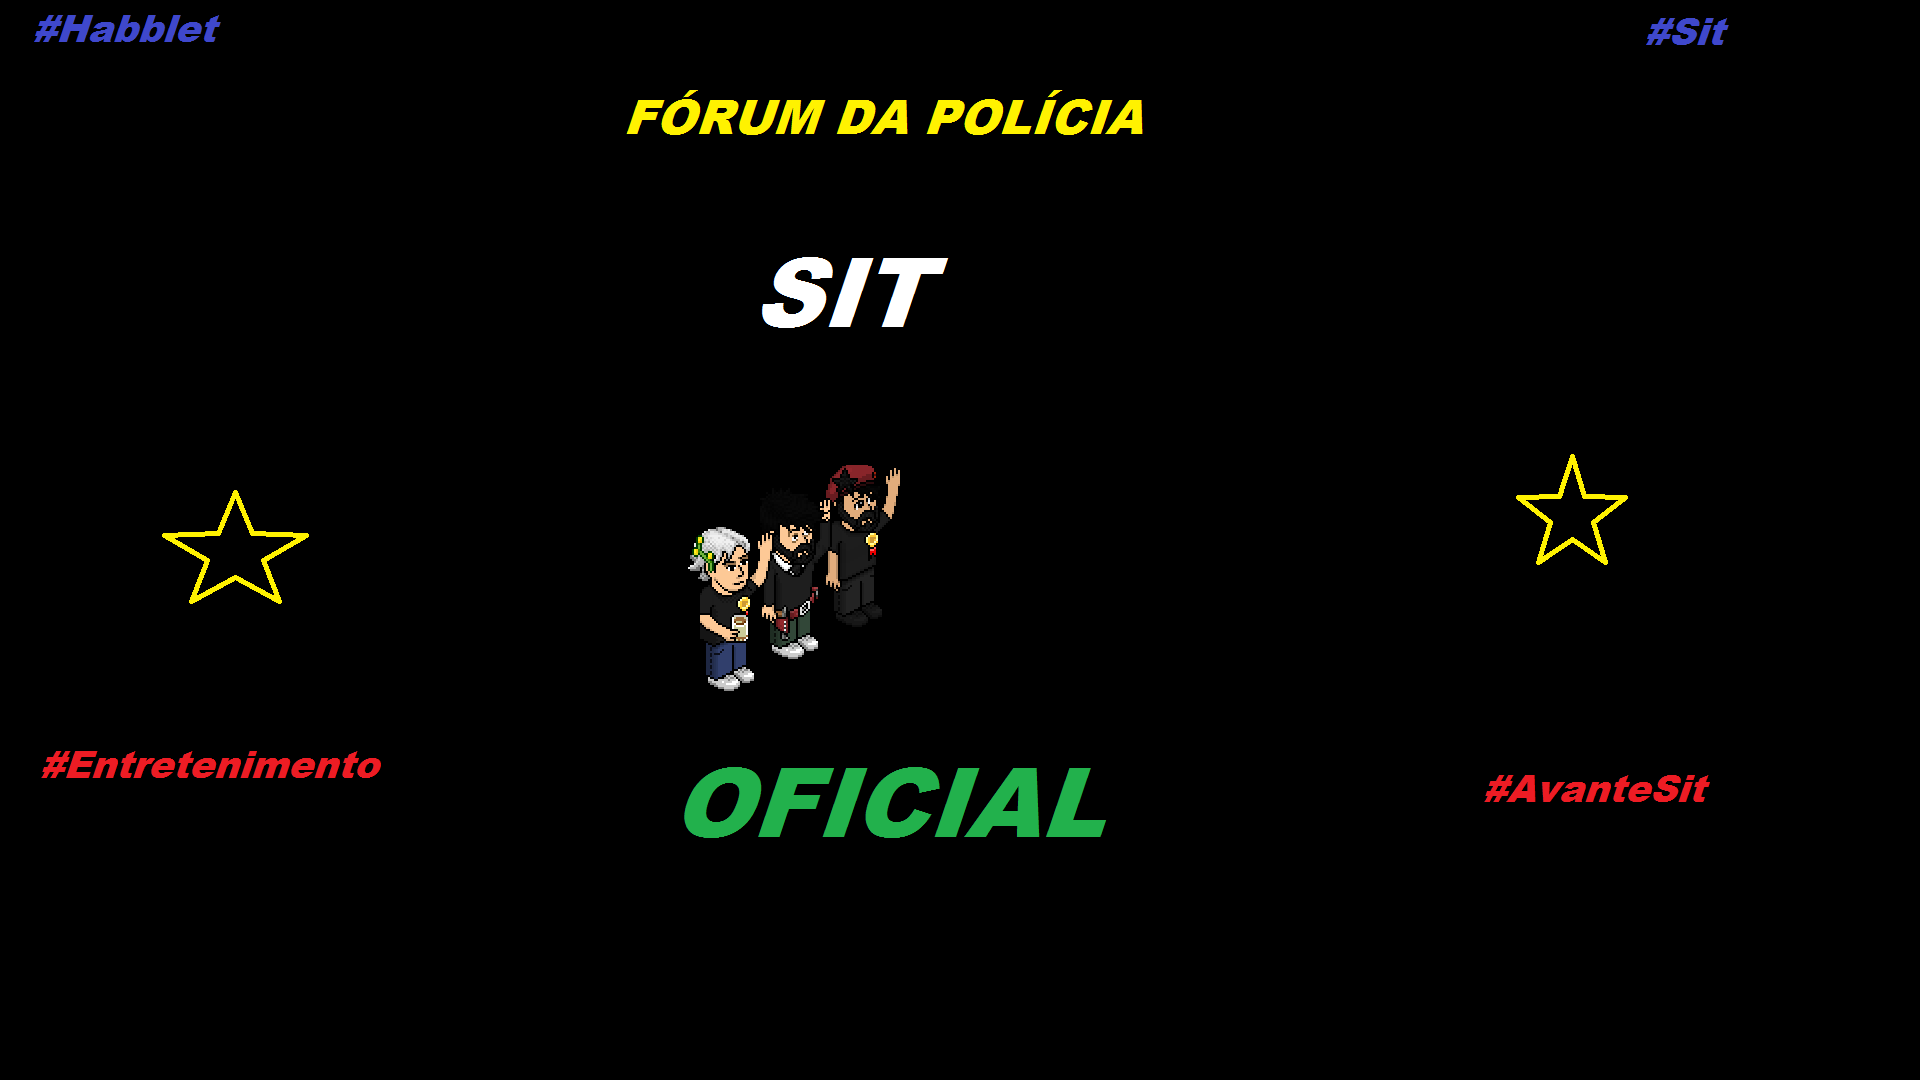 Polícia DME - Habblet - Portal: